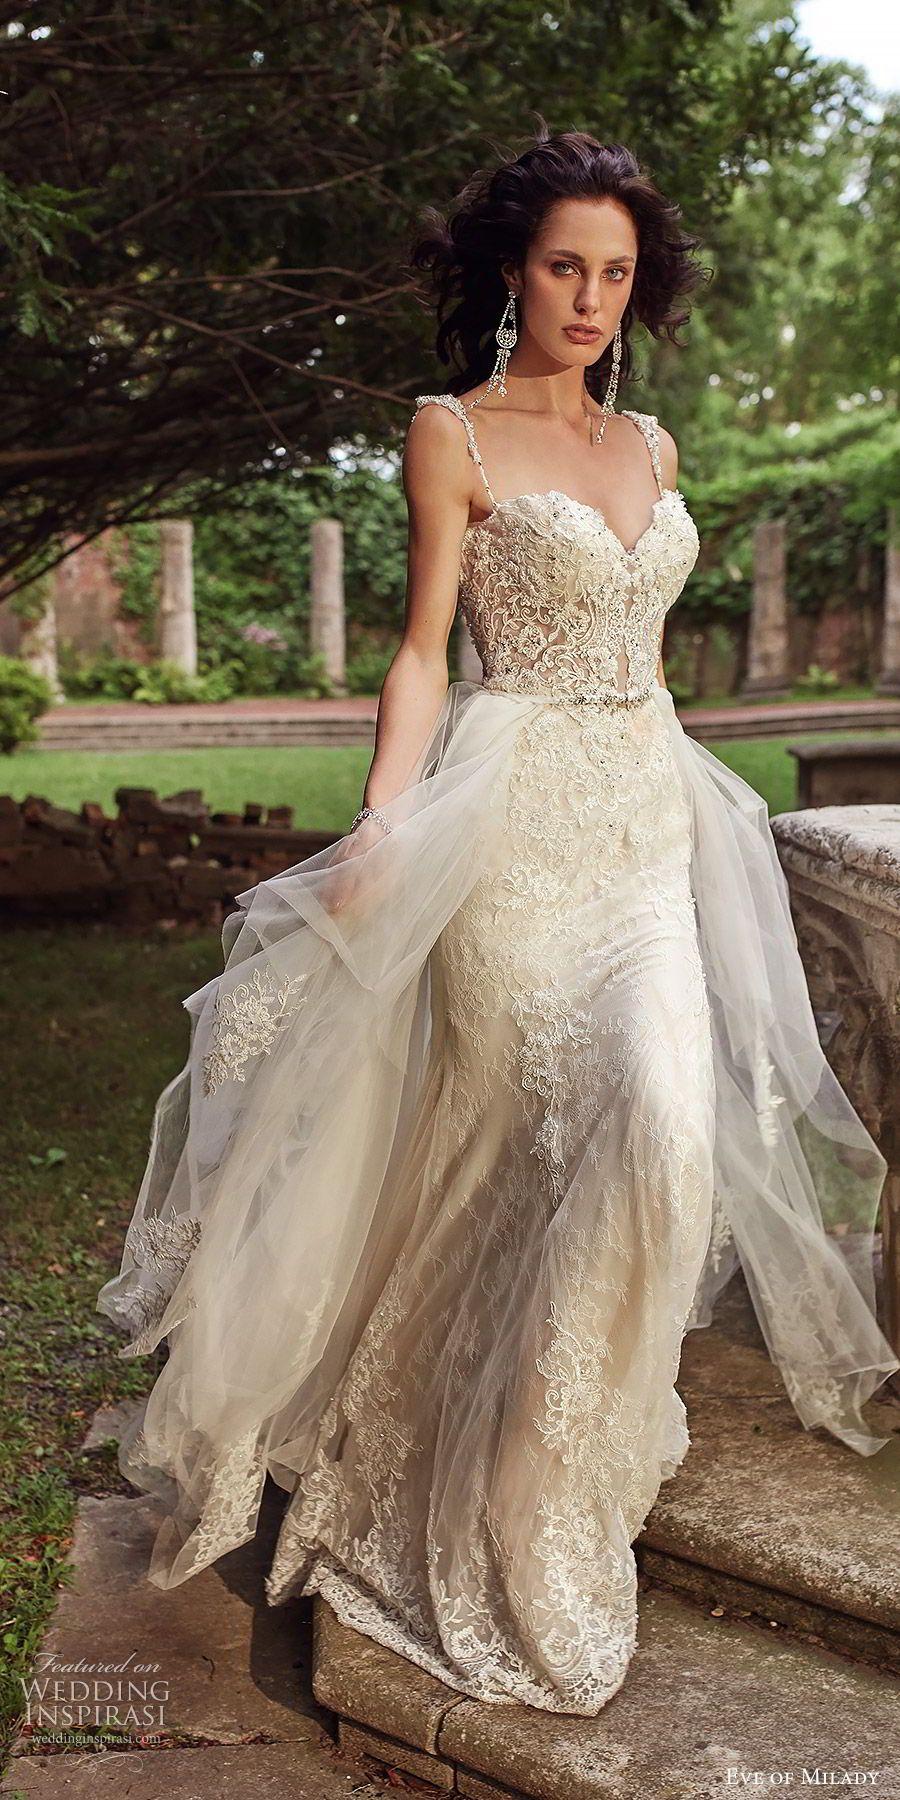 0e6ba786e7f1 eve of milady bridal spring 2018 sleeveless beaded straps sweetheart fully  embellished sheath wedding dress tiered overskirt (1601) ivory gold chapel  train ...